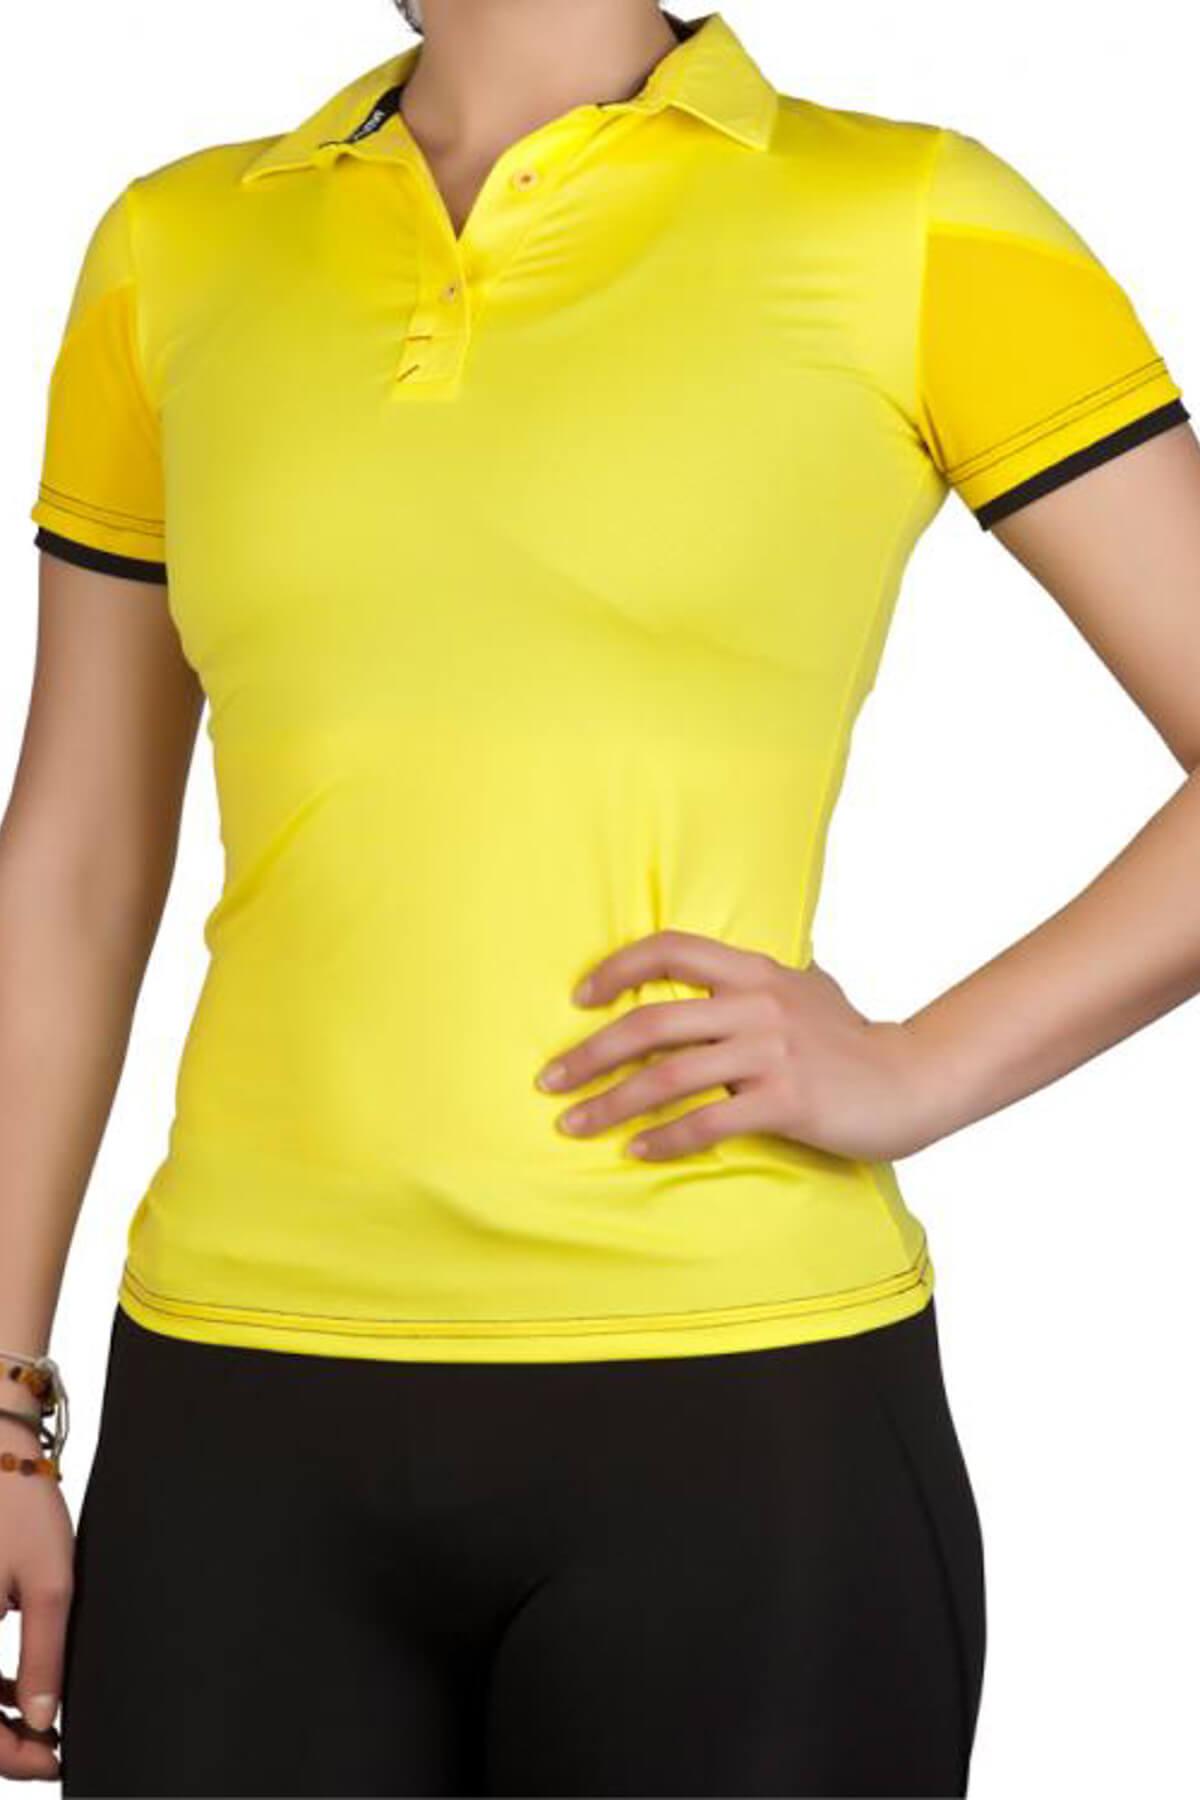 Exuma Kadın T-Shirt - Lime Spor T-Shirt - 172204 1